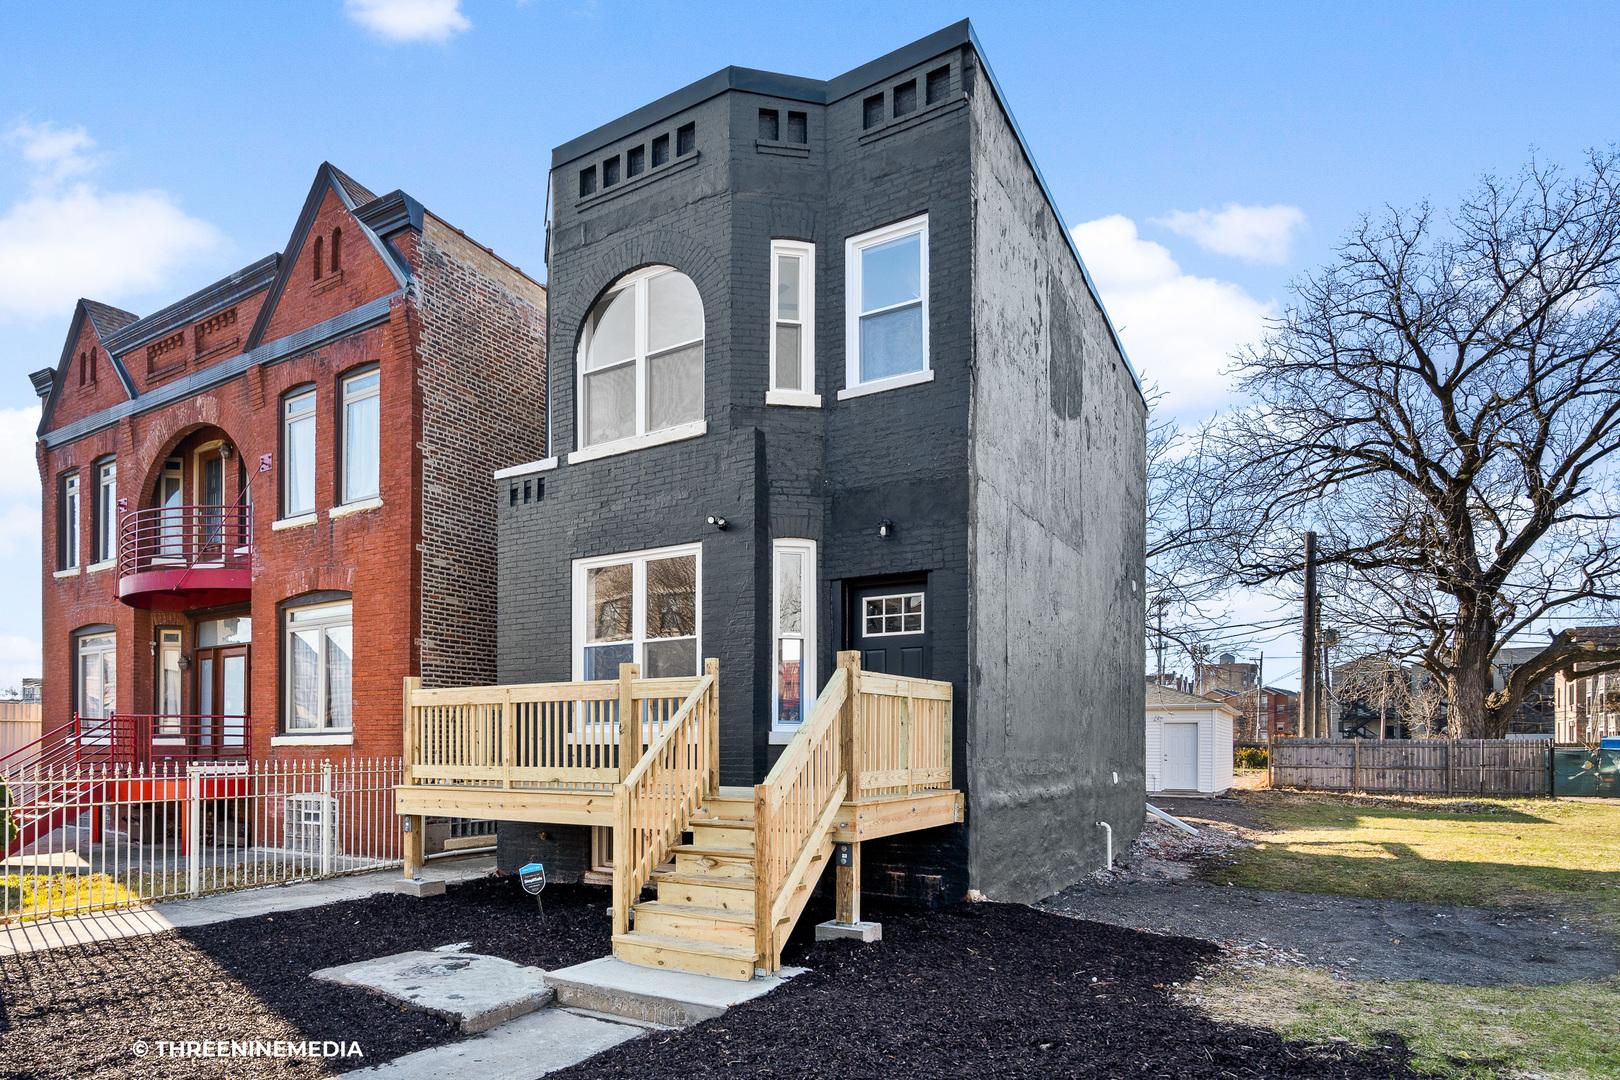 4248 Saint Lawrence ,Chicago, Illinois 60653